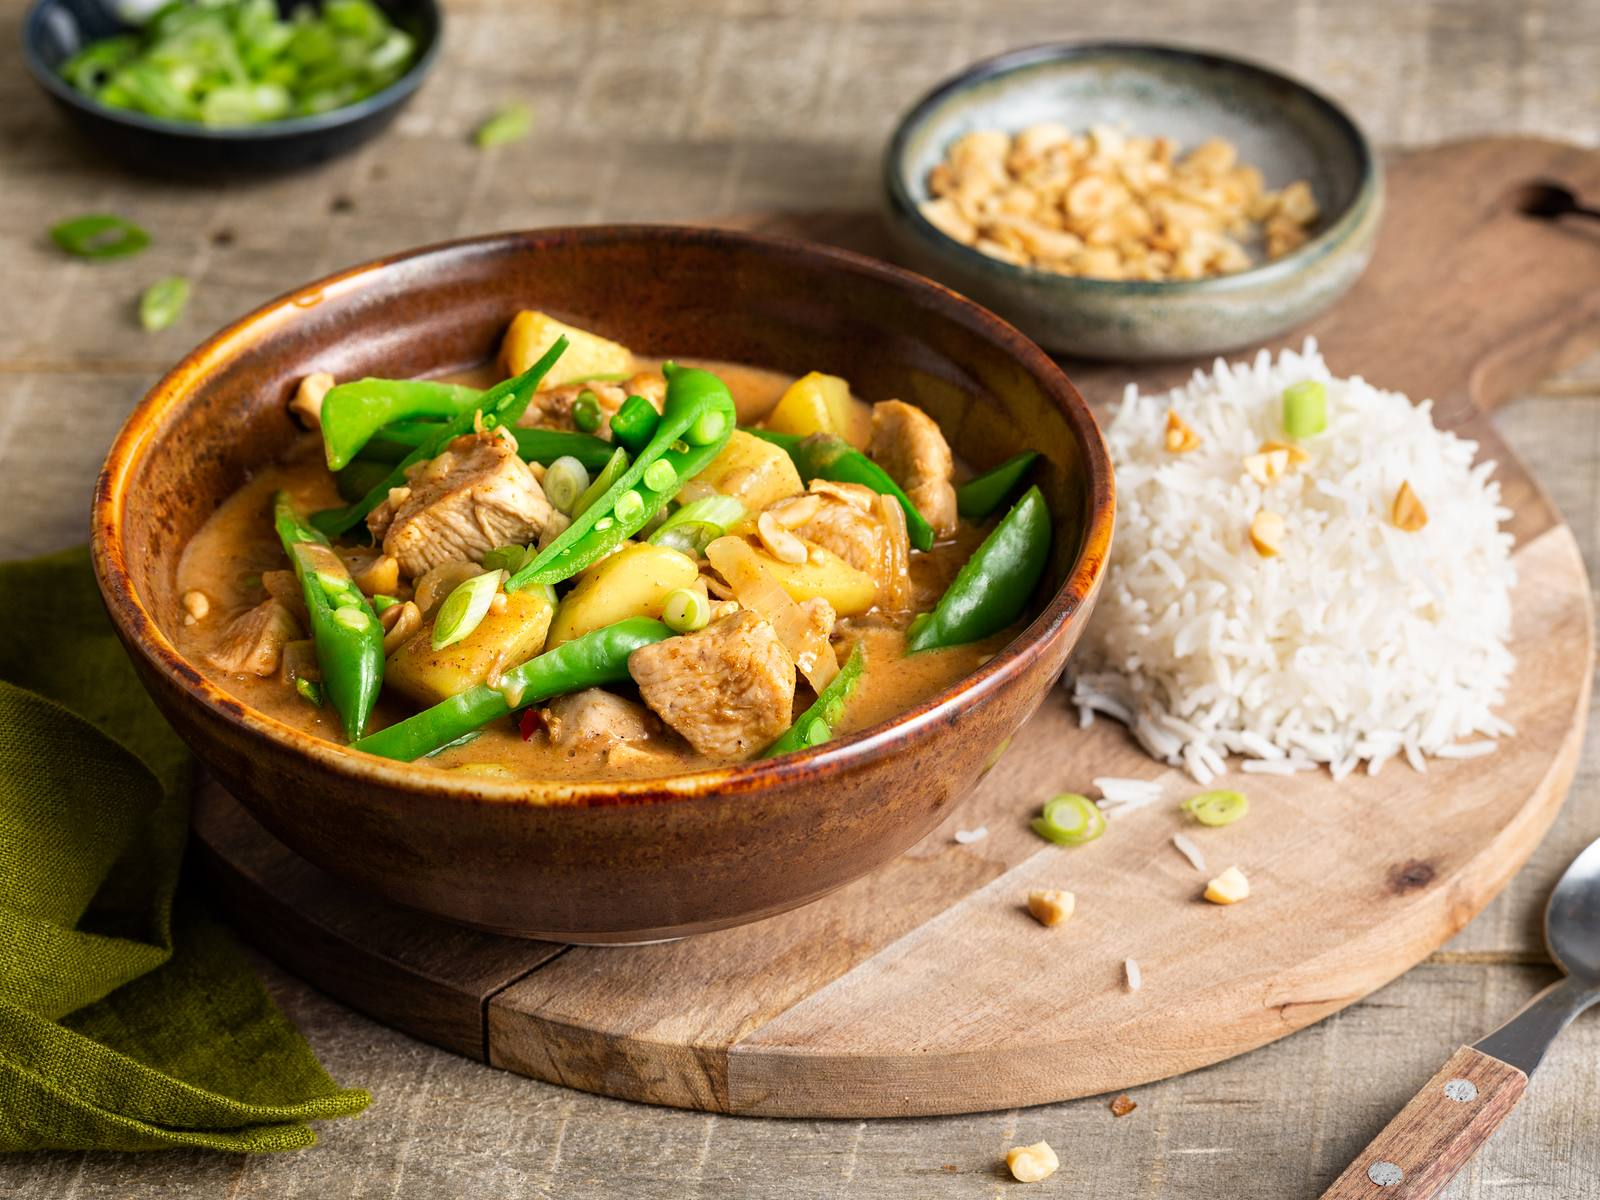 Thaise Massaman Curry met kip en sugarsnaps